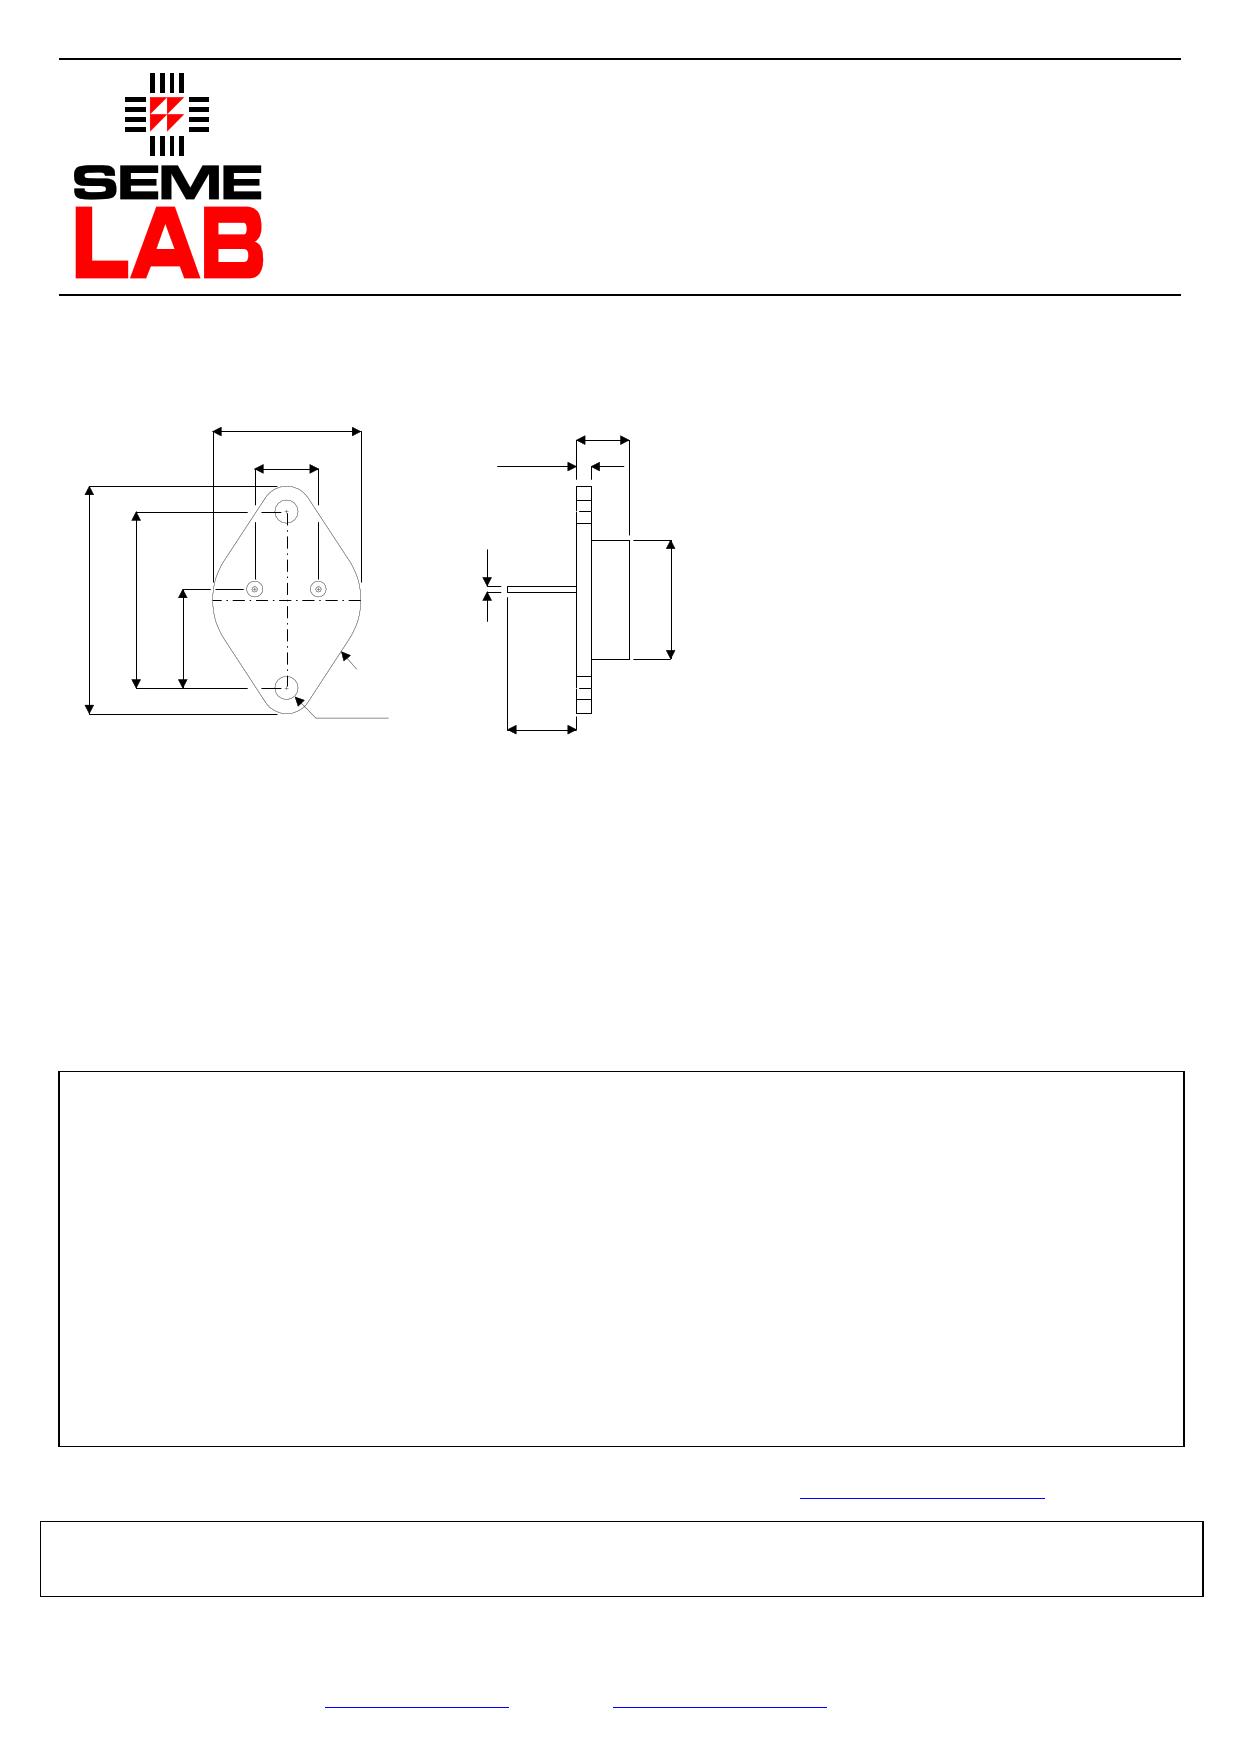 2N5068 datasheet